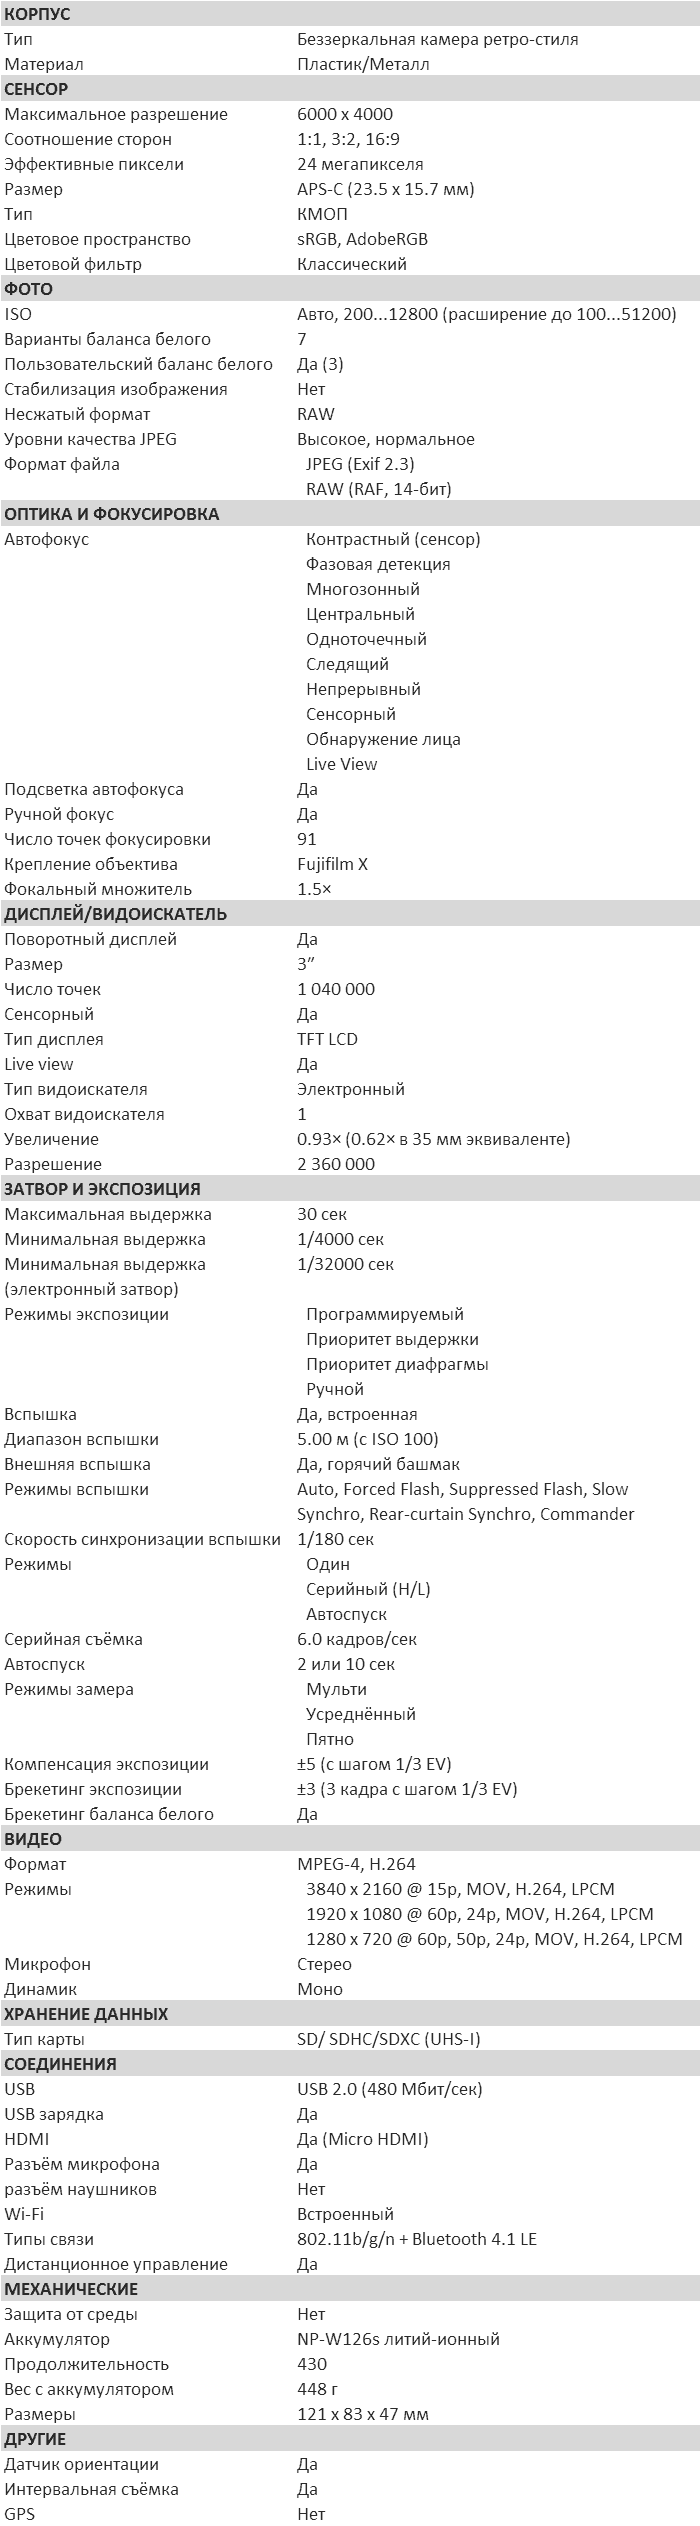 Характеристики X-T100